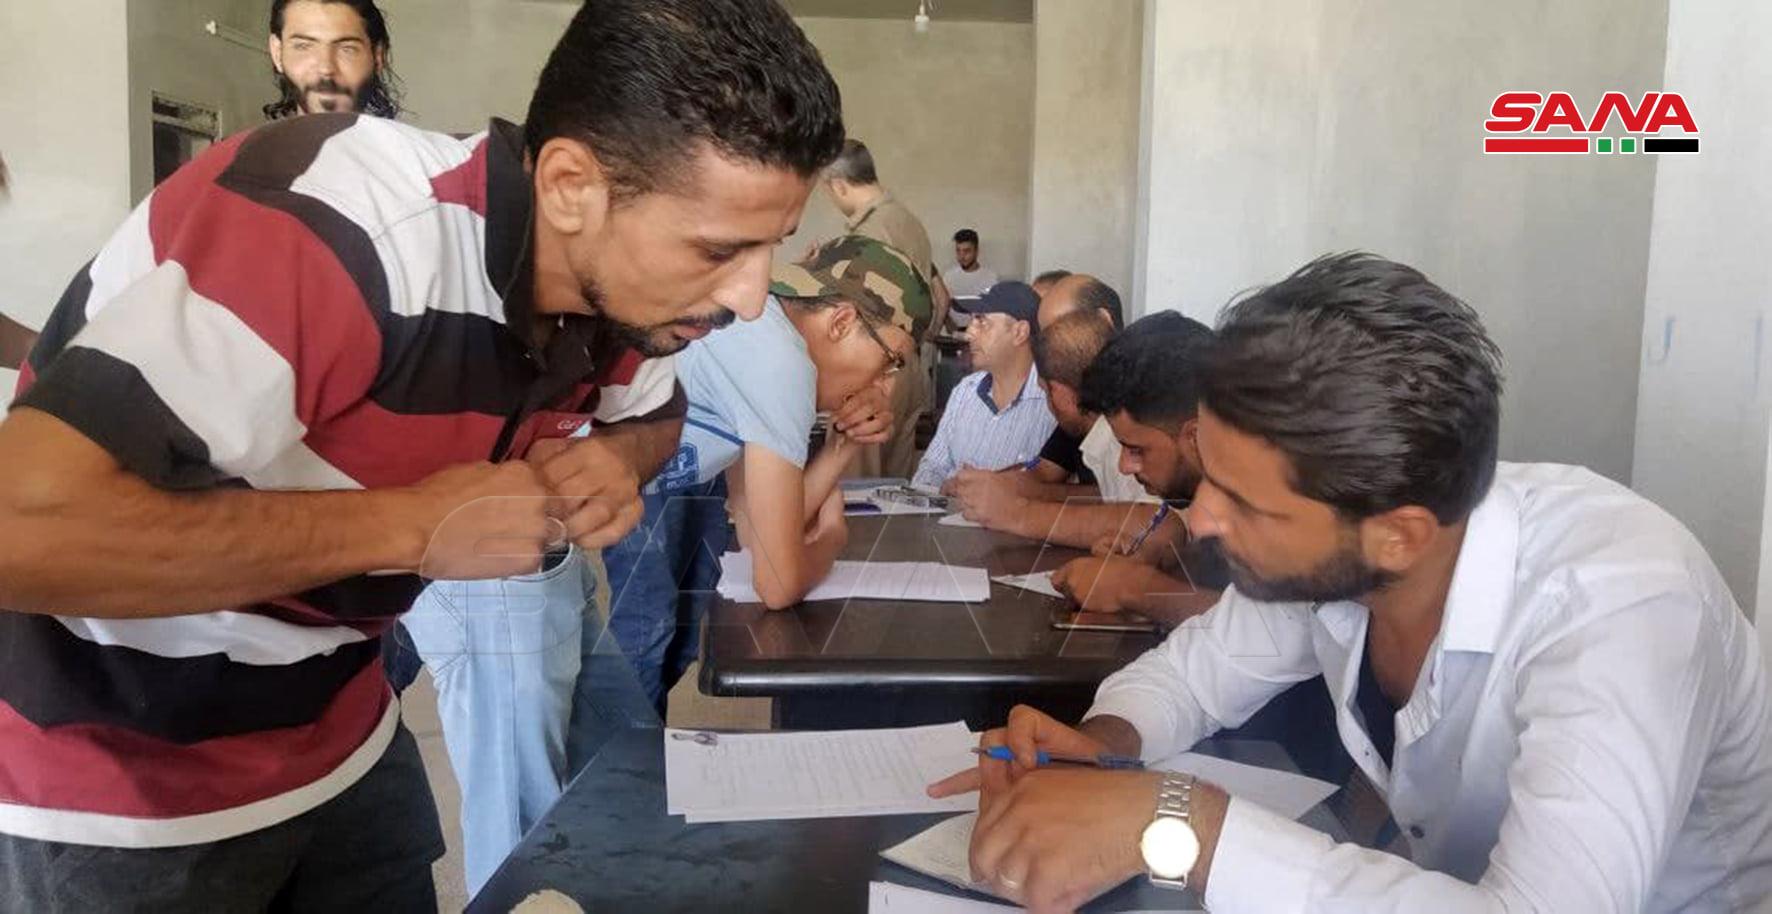 Senior Syrian Officers Visit Daraa Al-Bald As More Gunmen Join Reconciliation Process (Video, Photos)